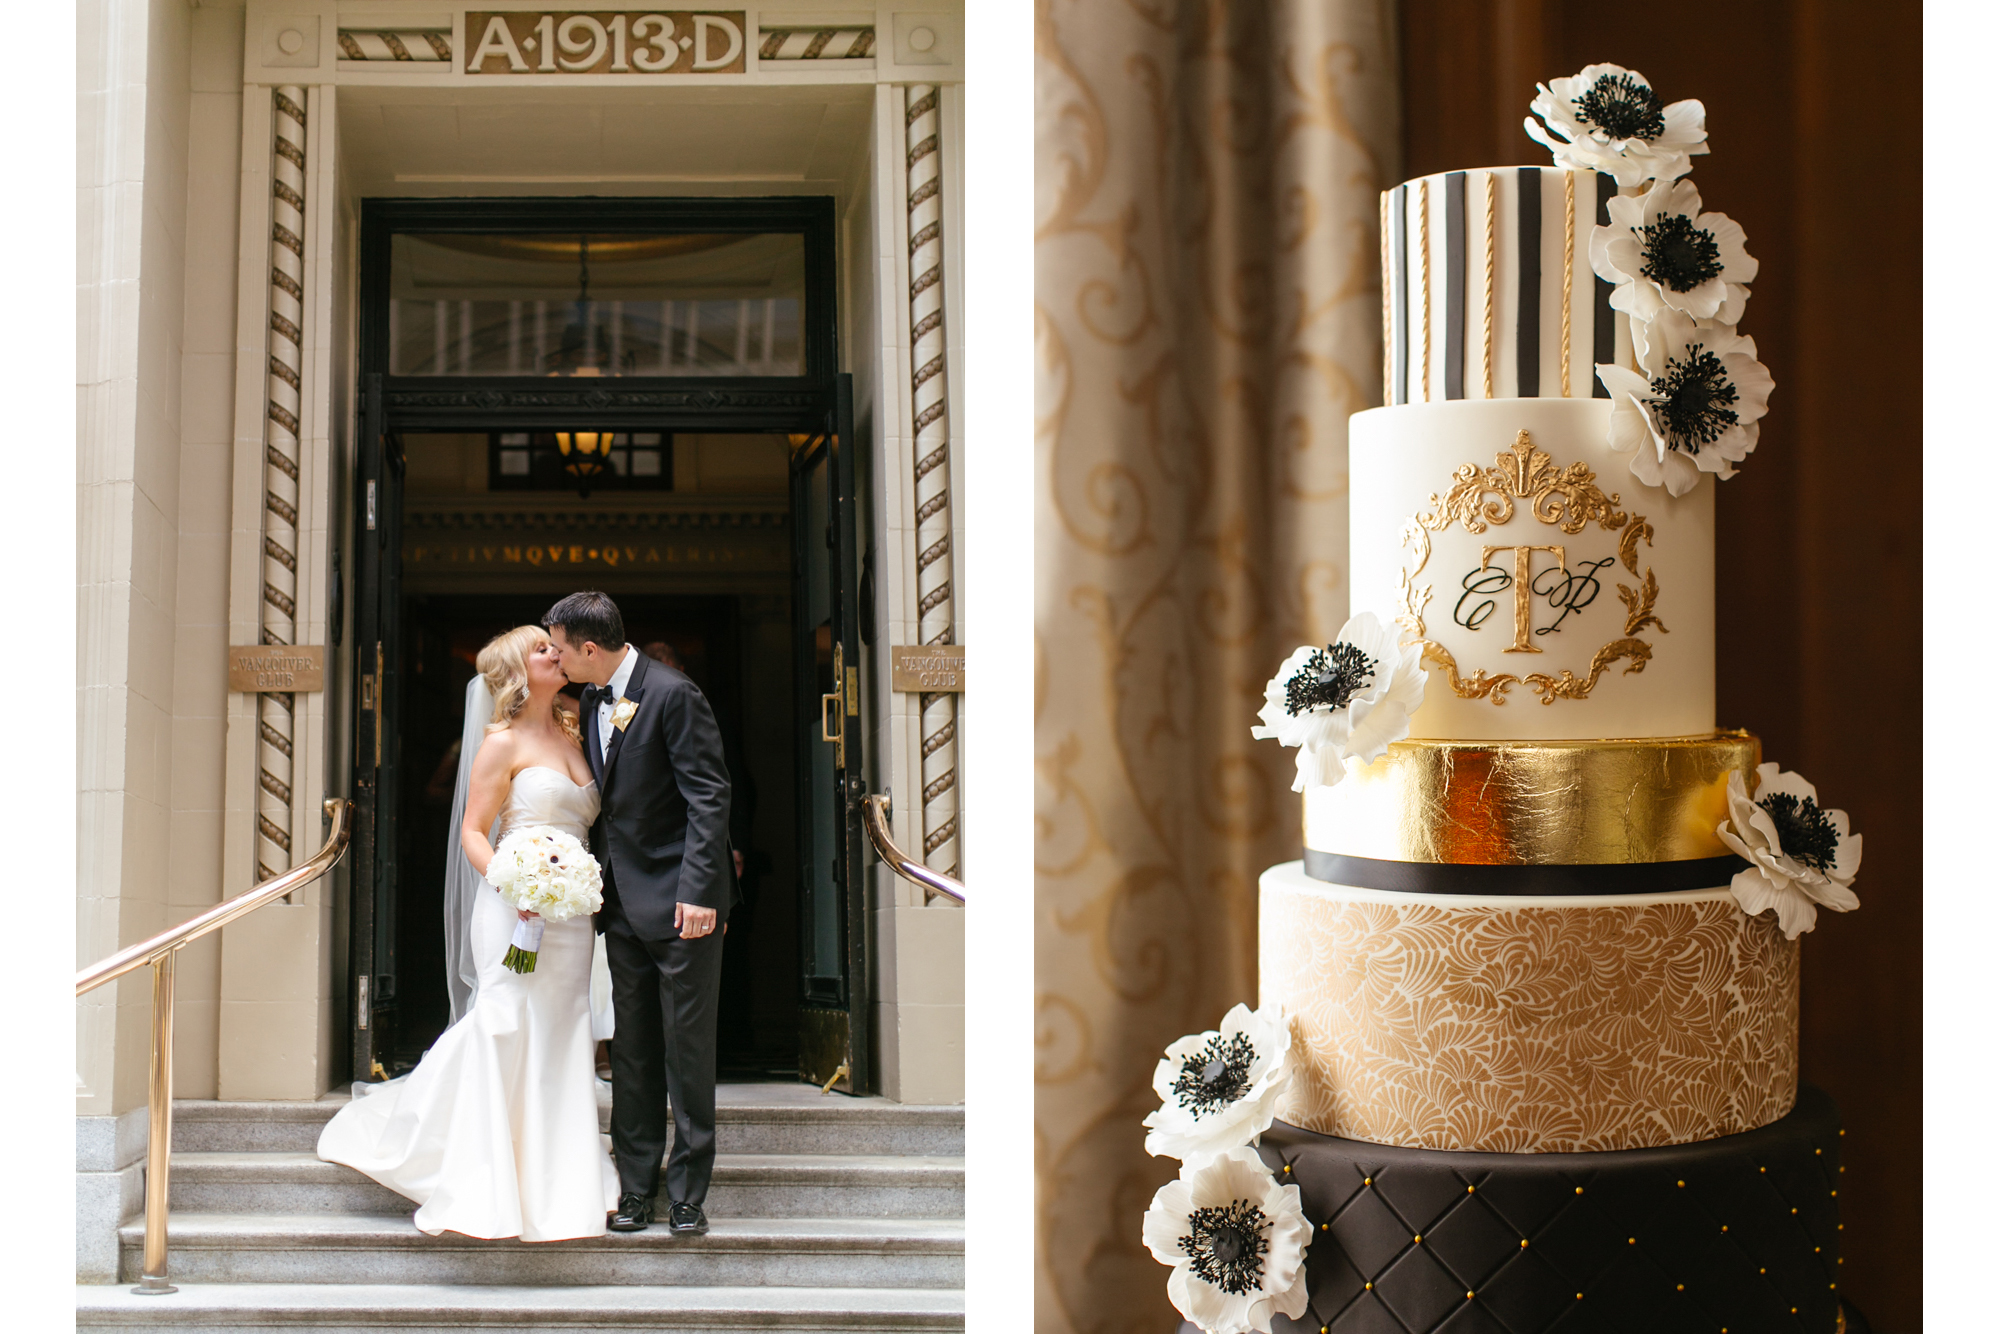 vancouver-luxury-wedding-photographer-lori-miles-6.jpg